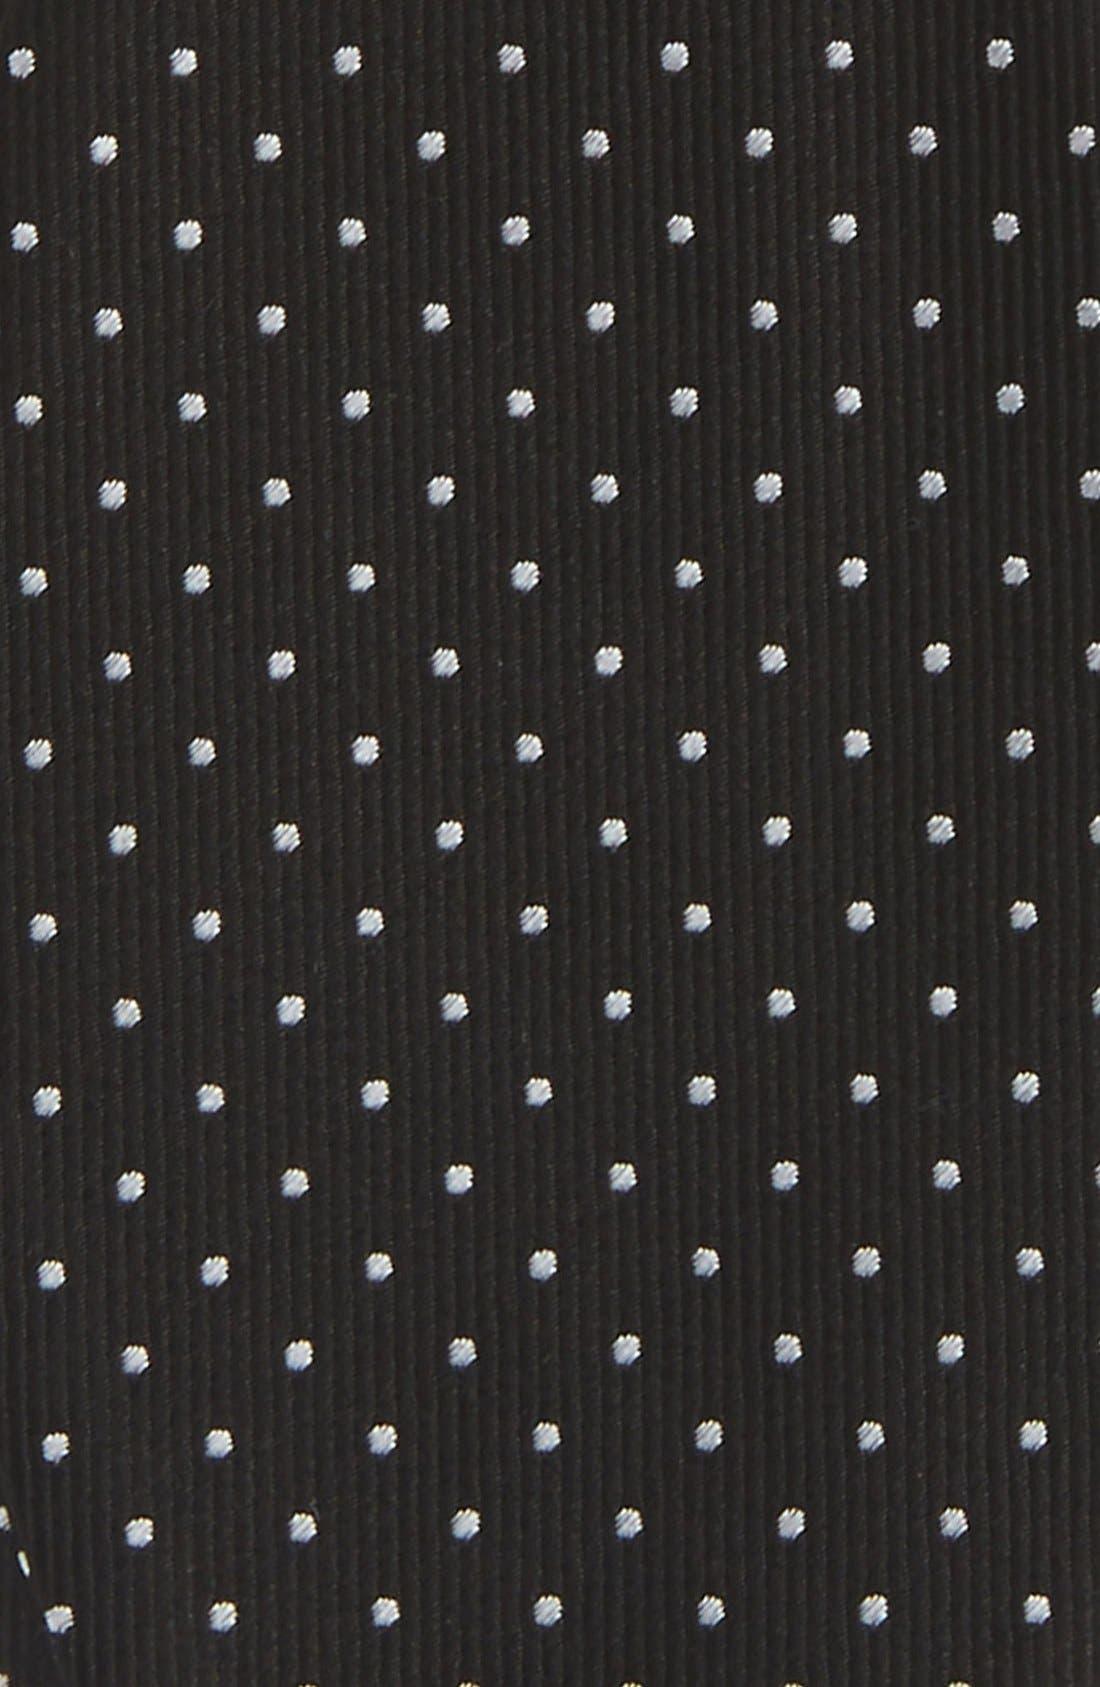 Dot Silk Bow Tie,                             Alternate thumbnail 3, color,                             001